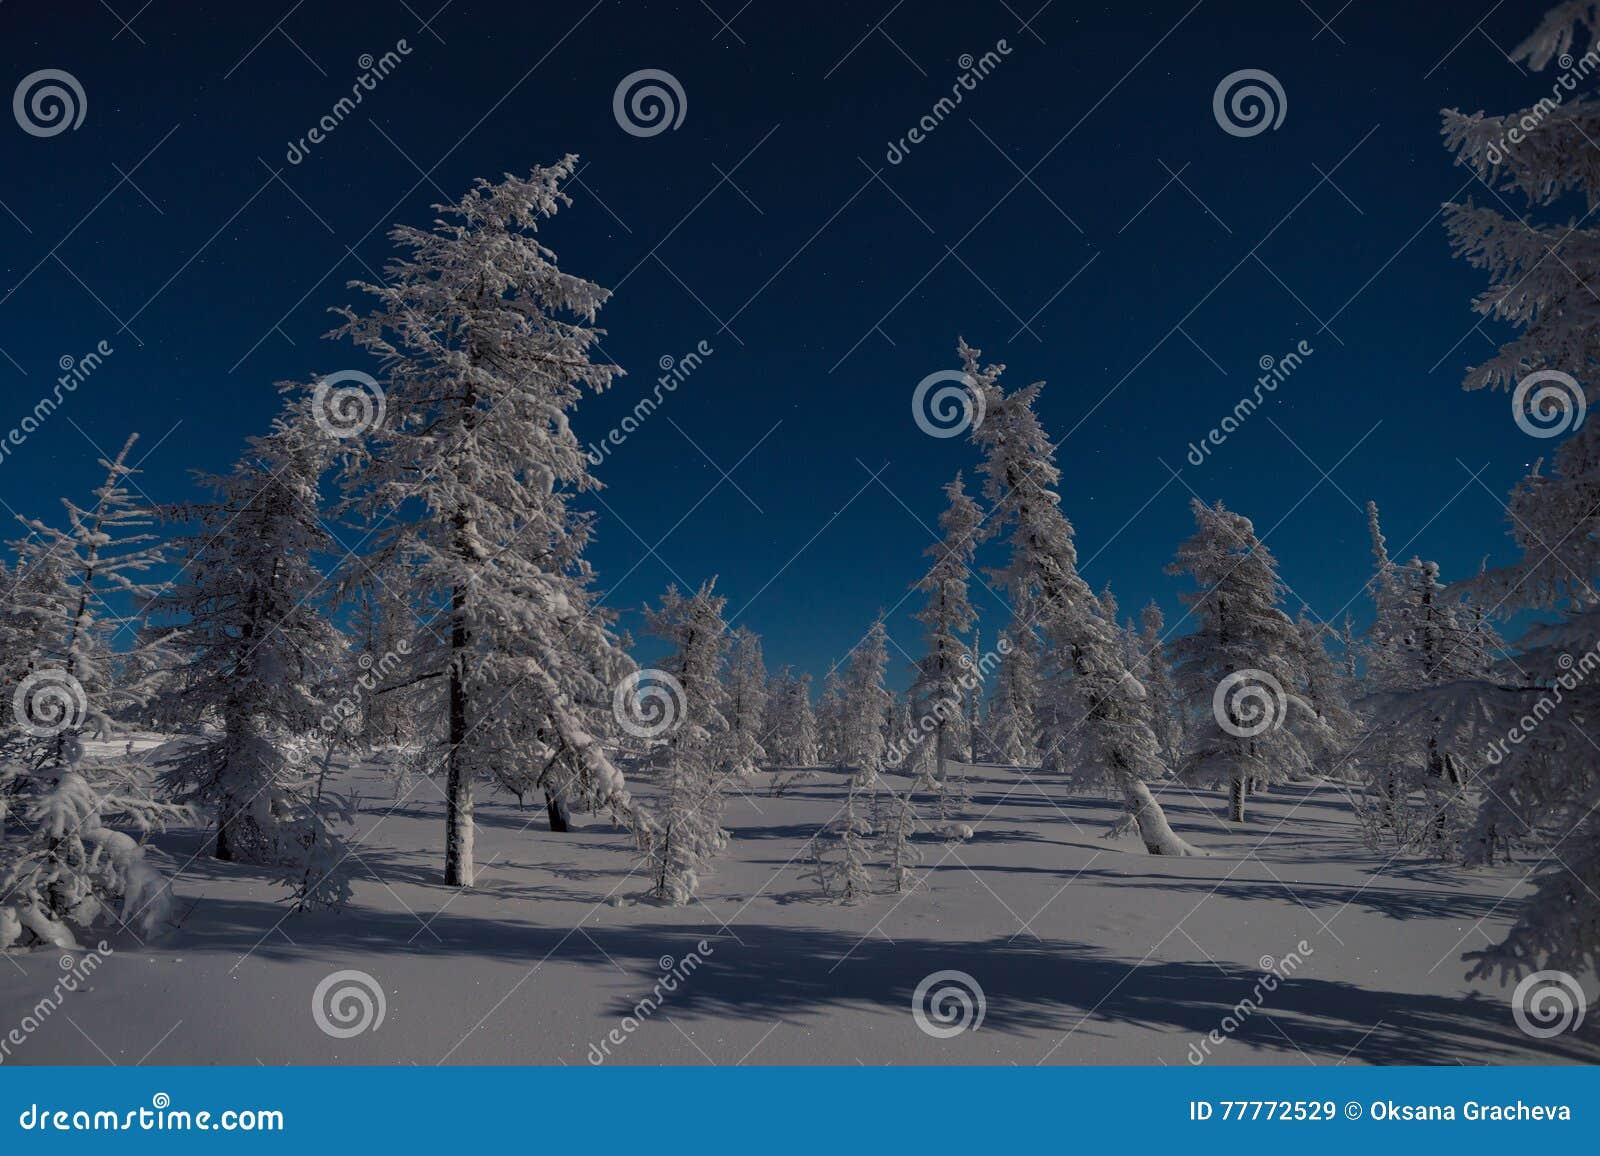 winter landscape trees royalty free stock photography cartoondealer